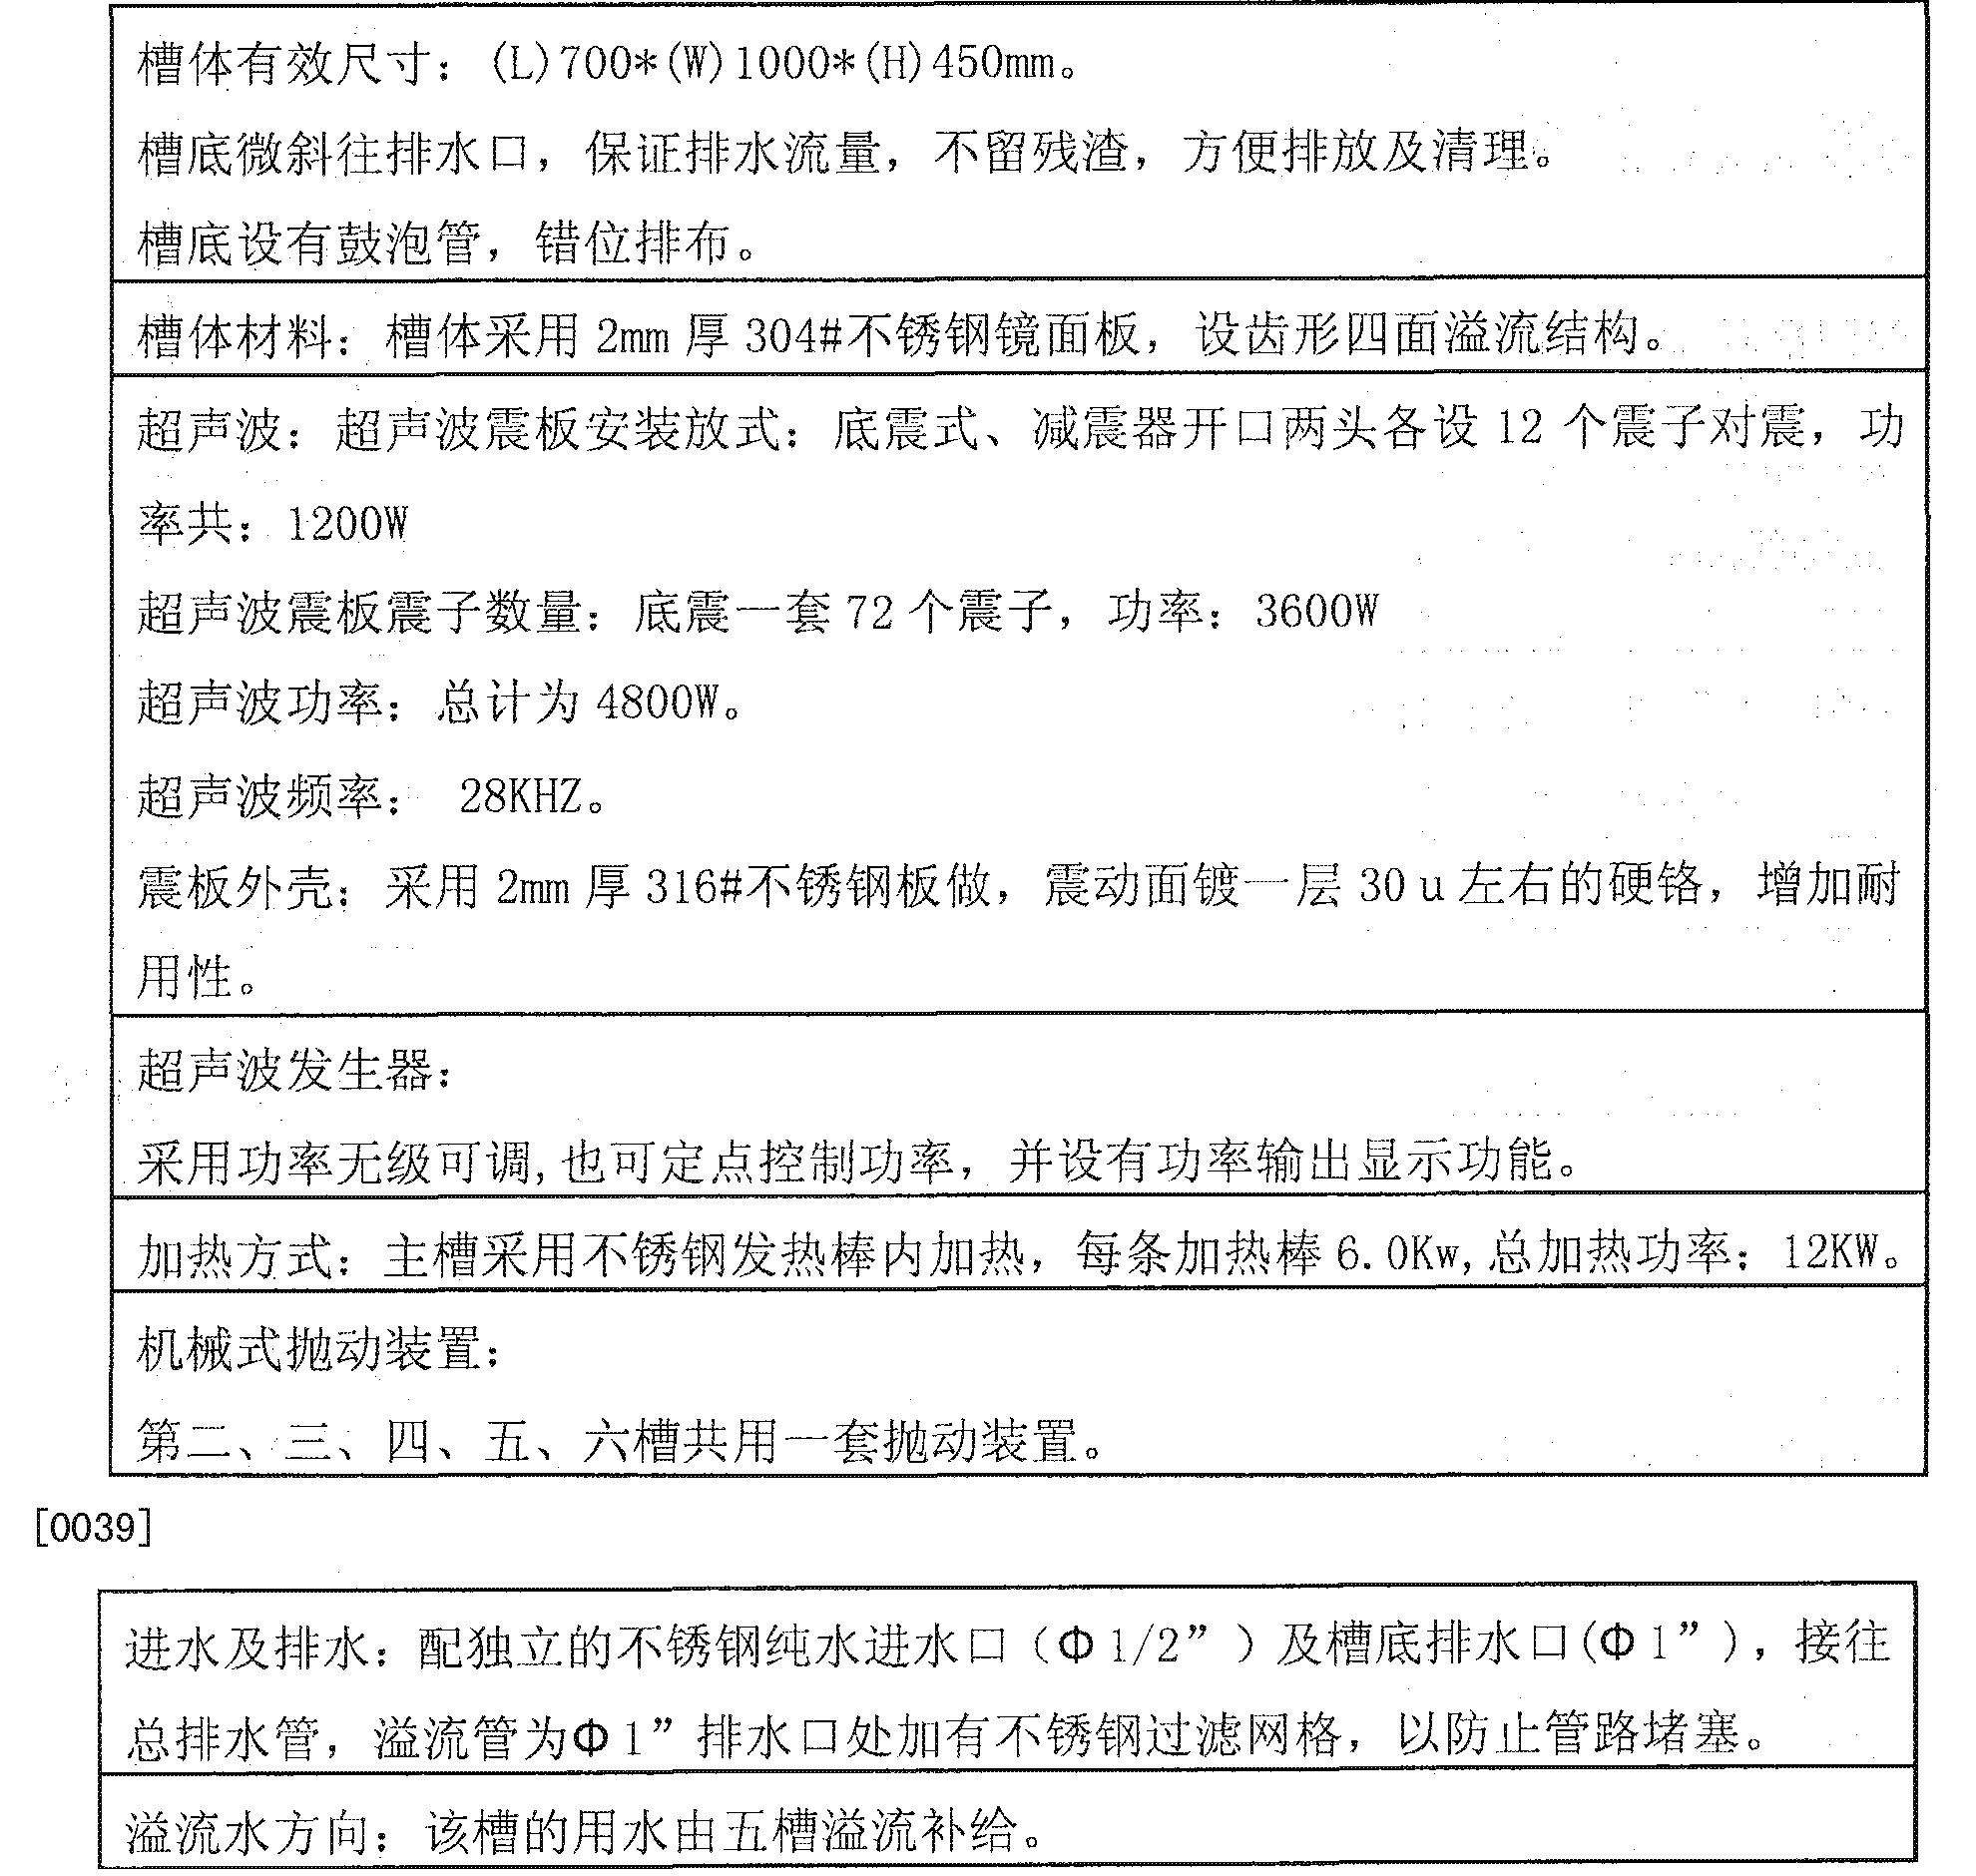 Figure CN204035120UD00091